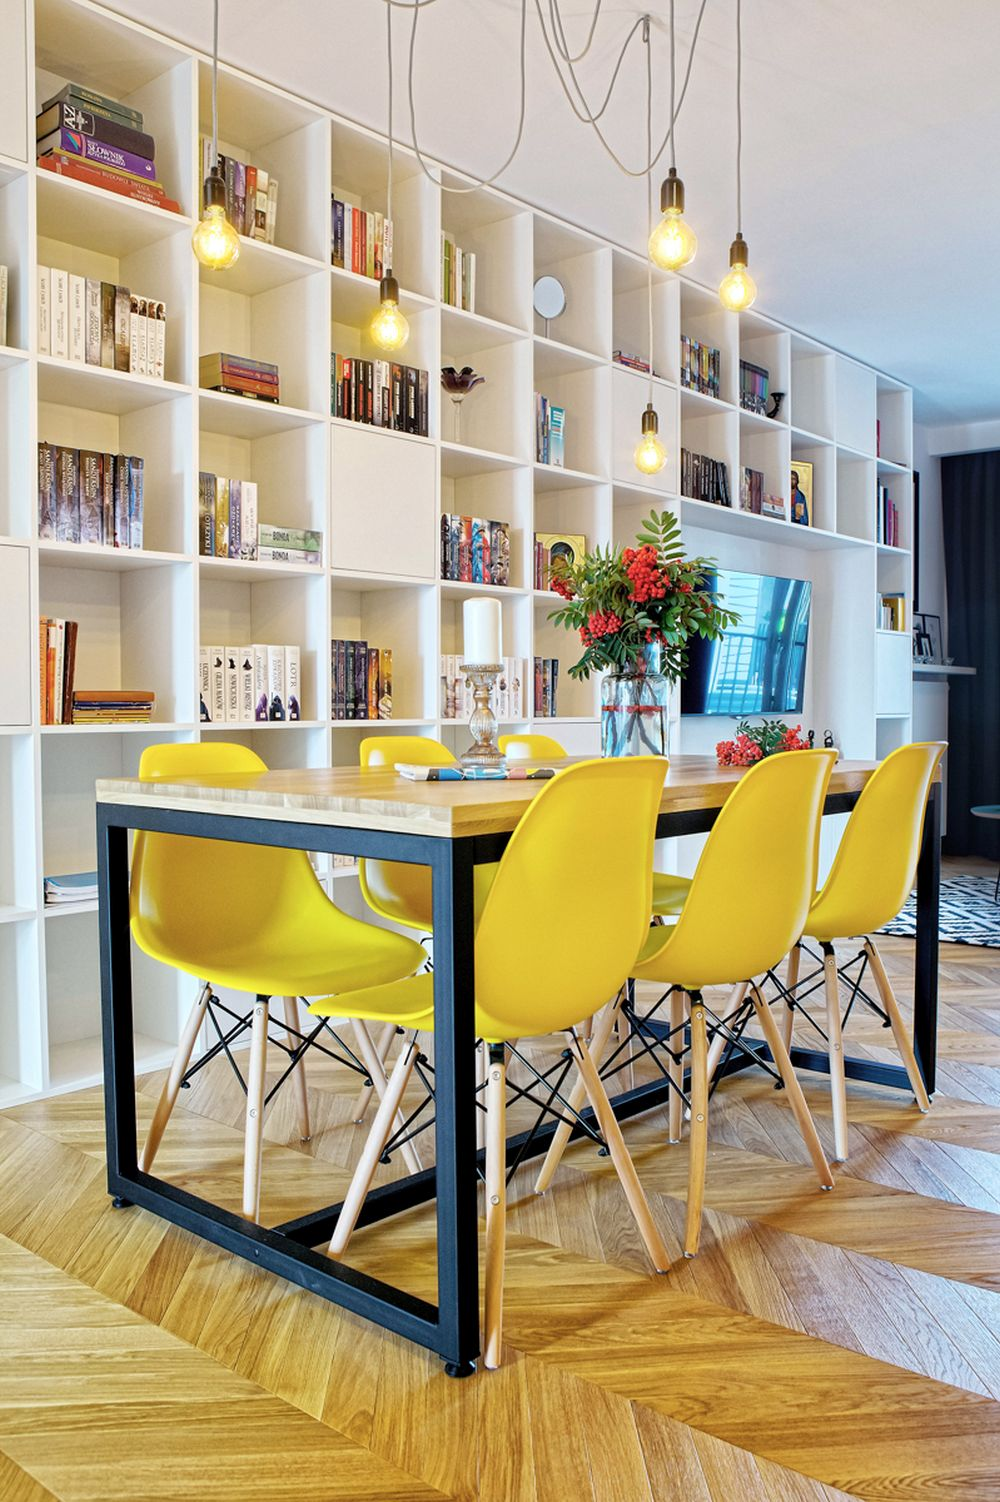 adelaparvu.com despre apartament 60 mp, Polonia, Designer Pawel Liszewski, Foto Tomasz Suszczynski, sufragerie (4)